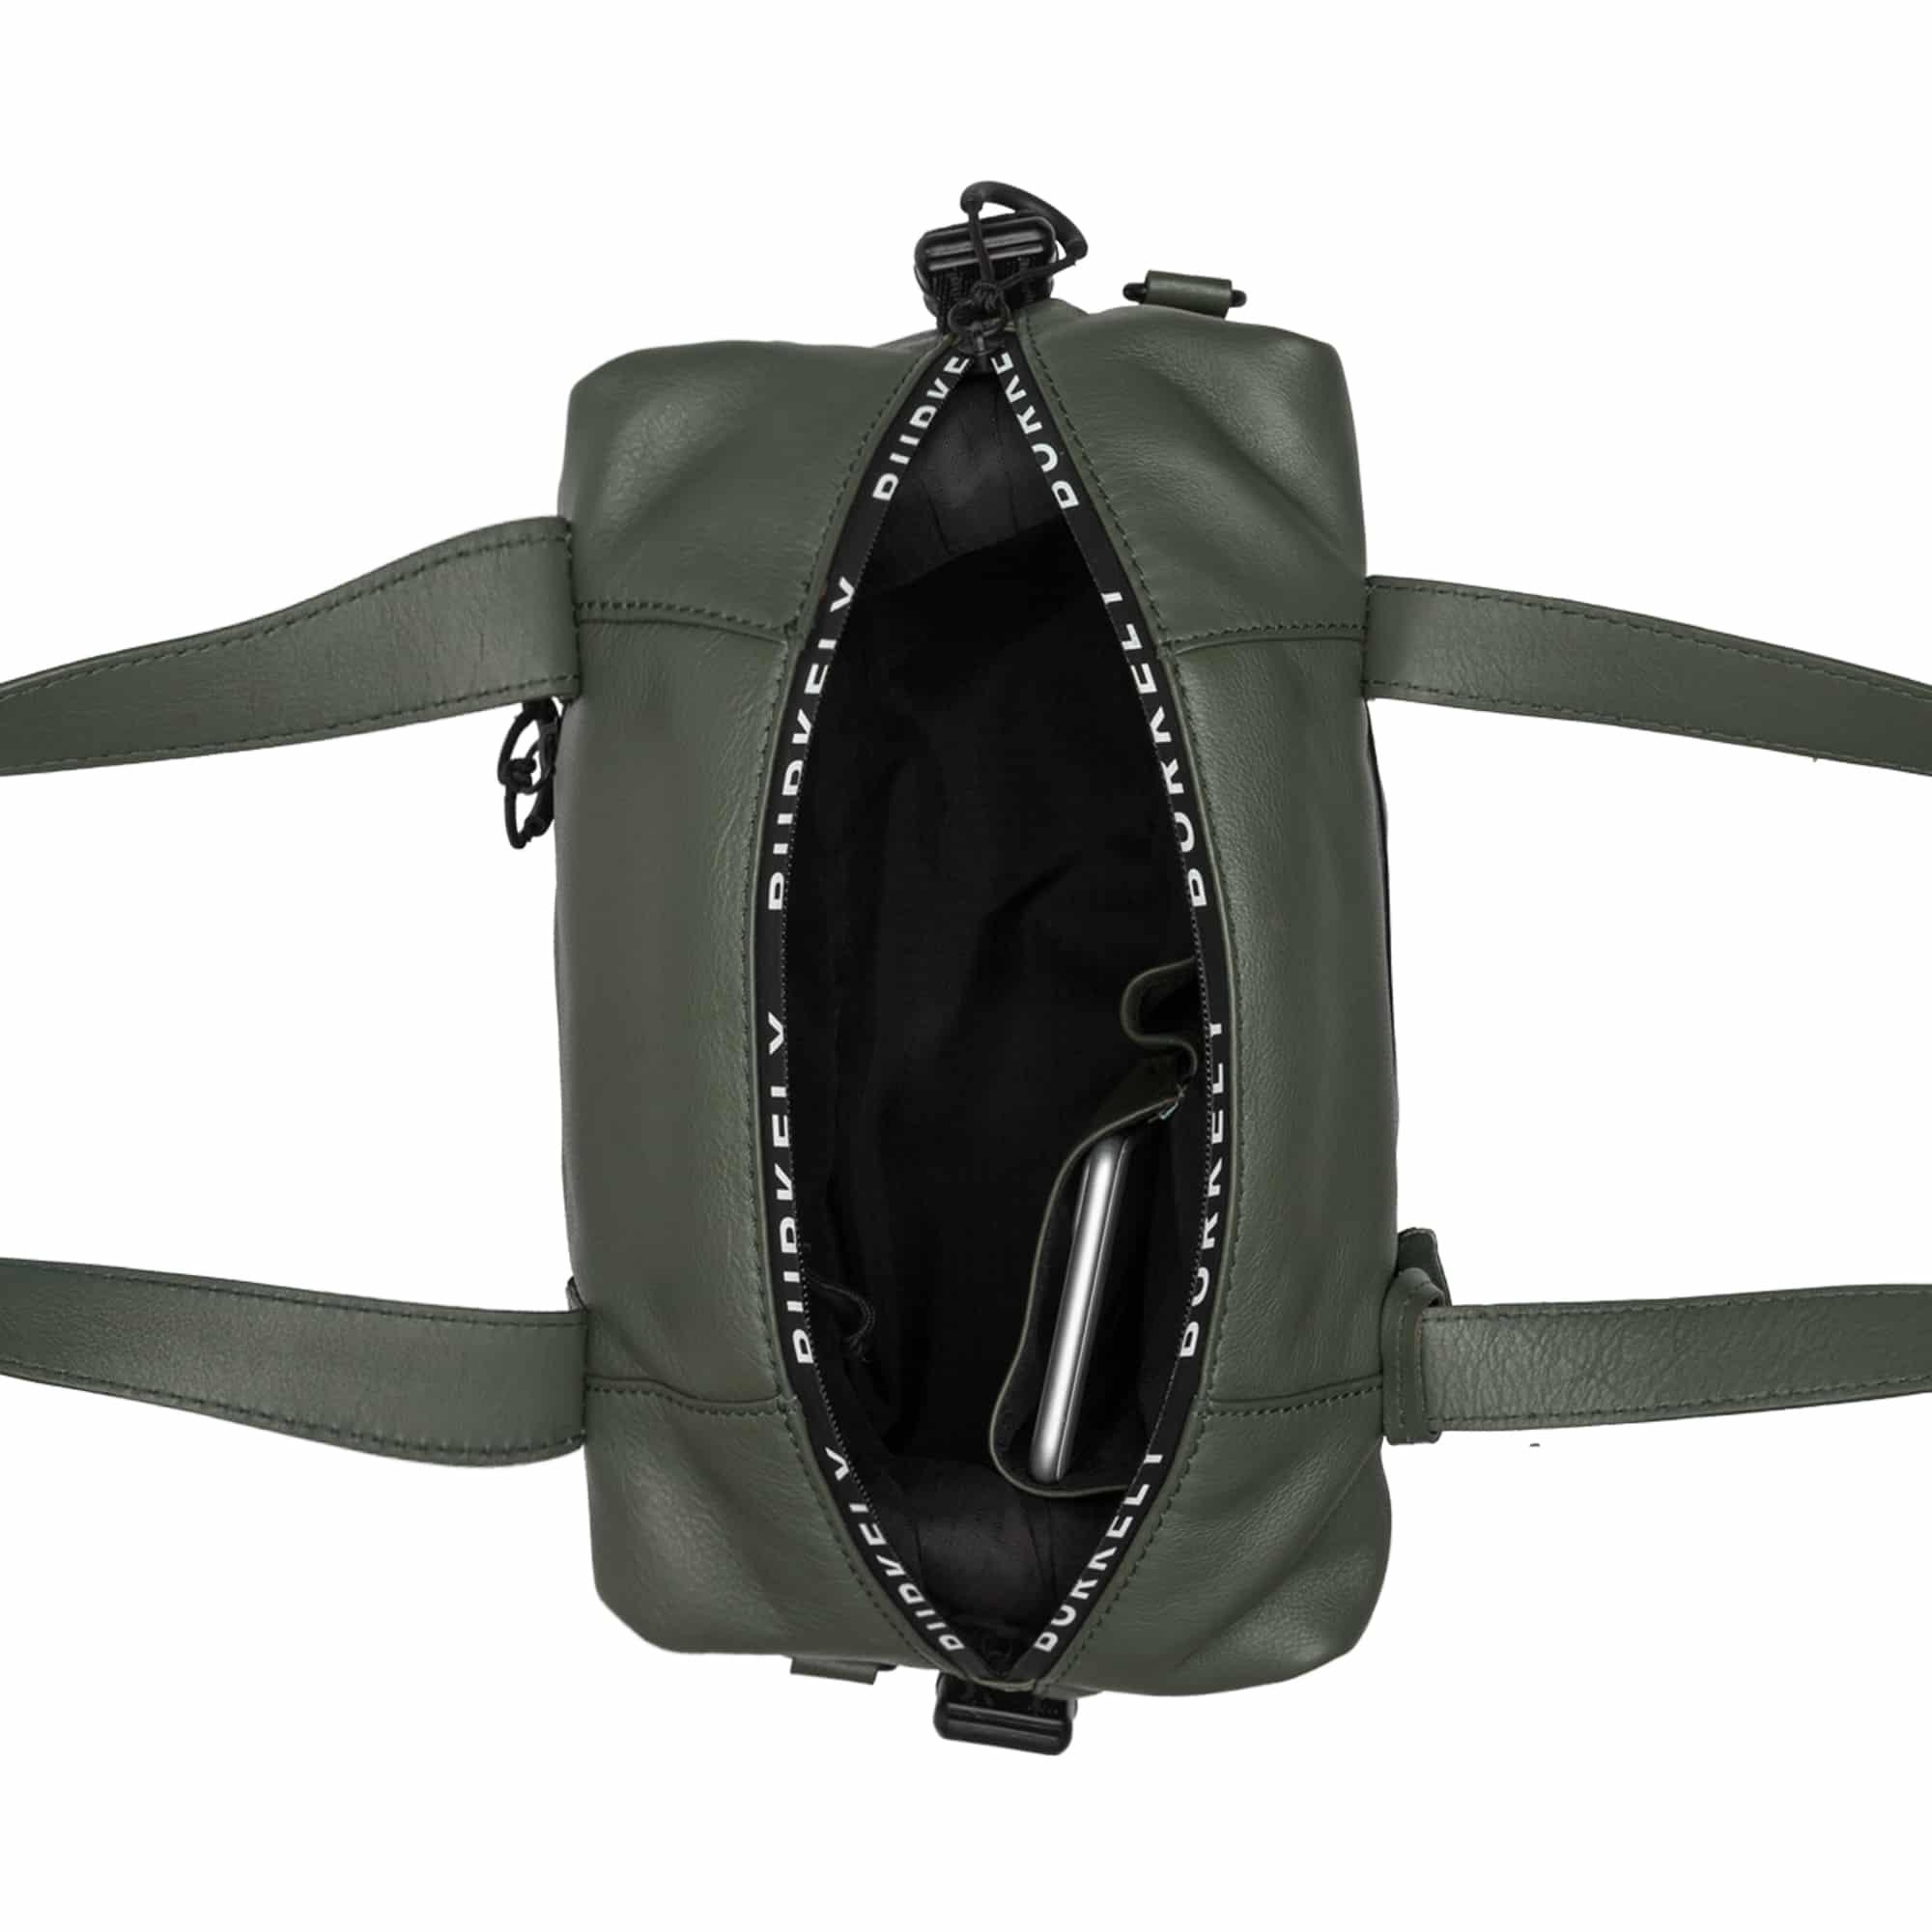 Burkely Rebel Reese Small Handbag Green-185056